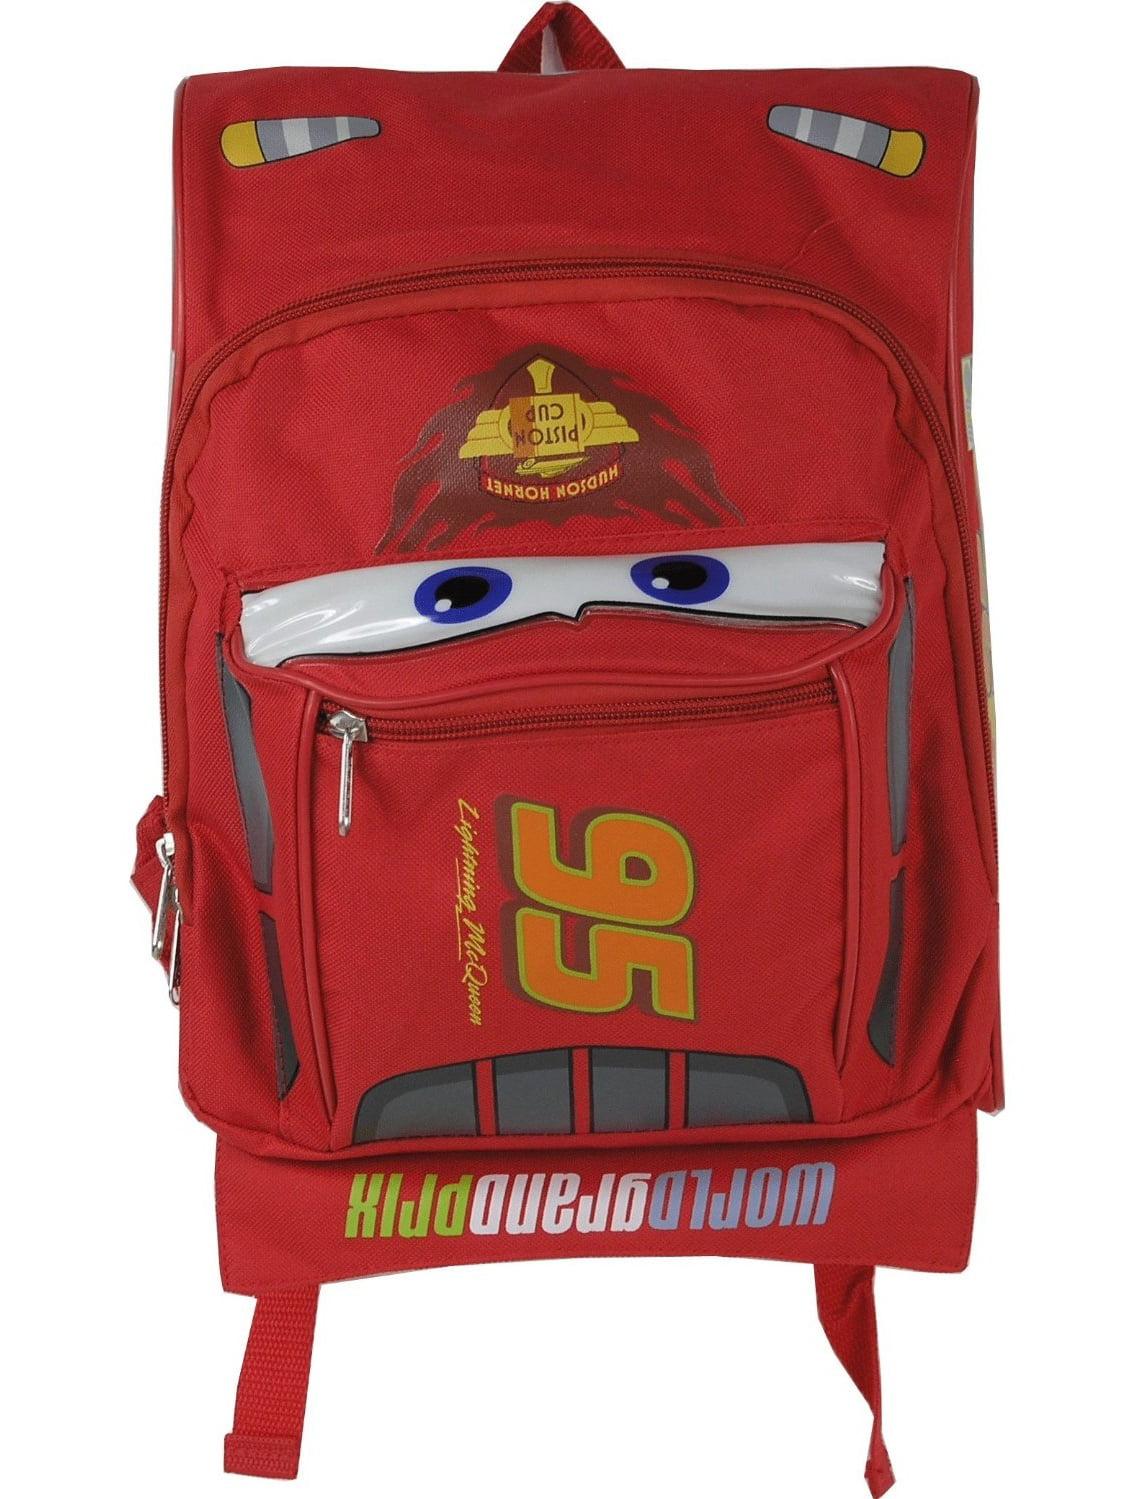 Pixar Cars Lightning McQueen Shape 10 inches Mini Backpack